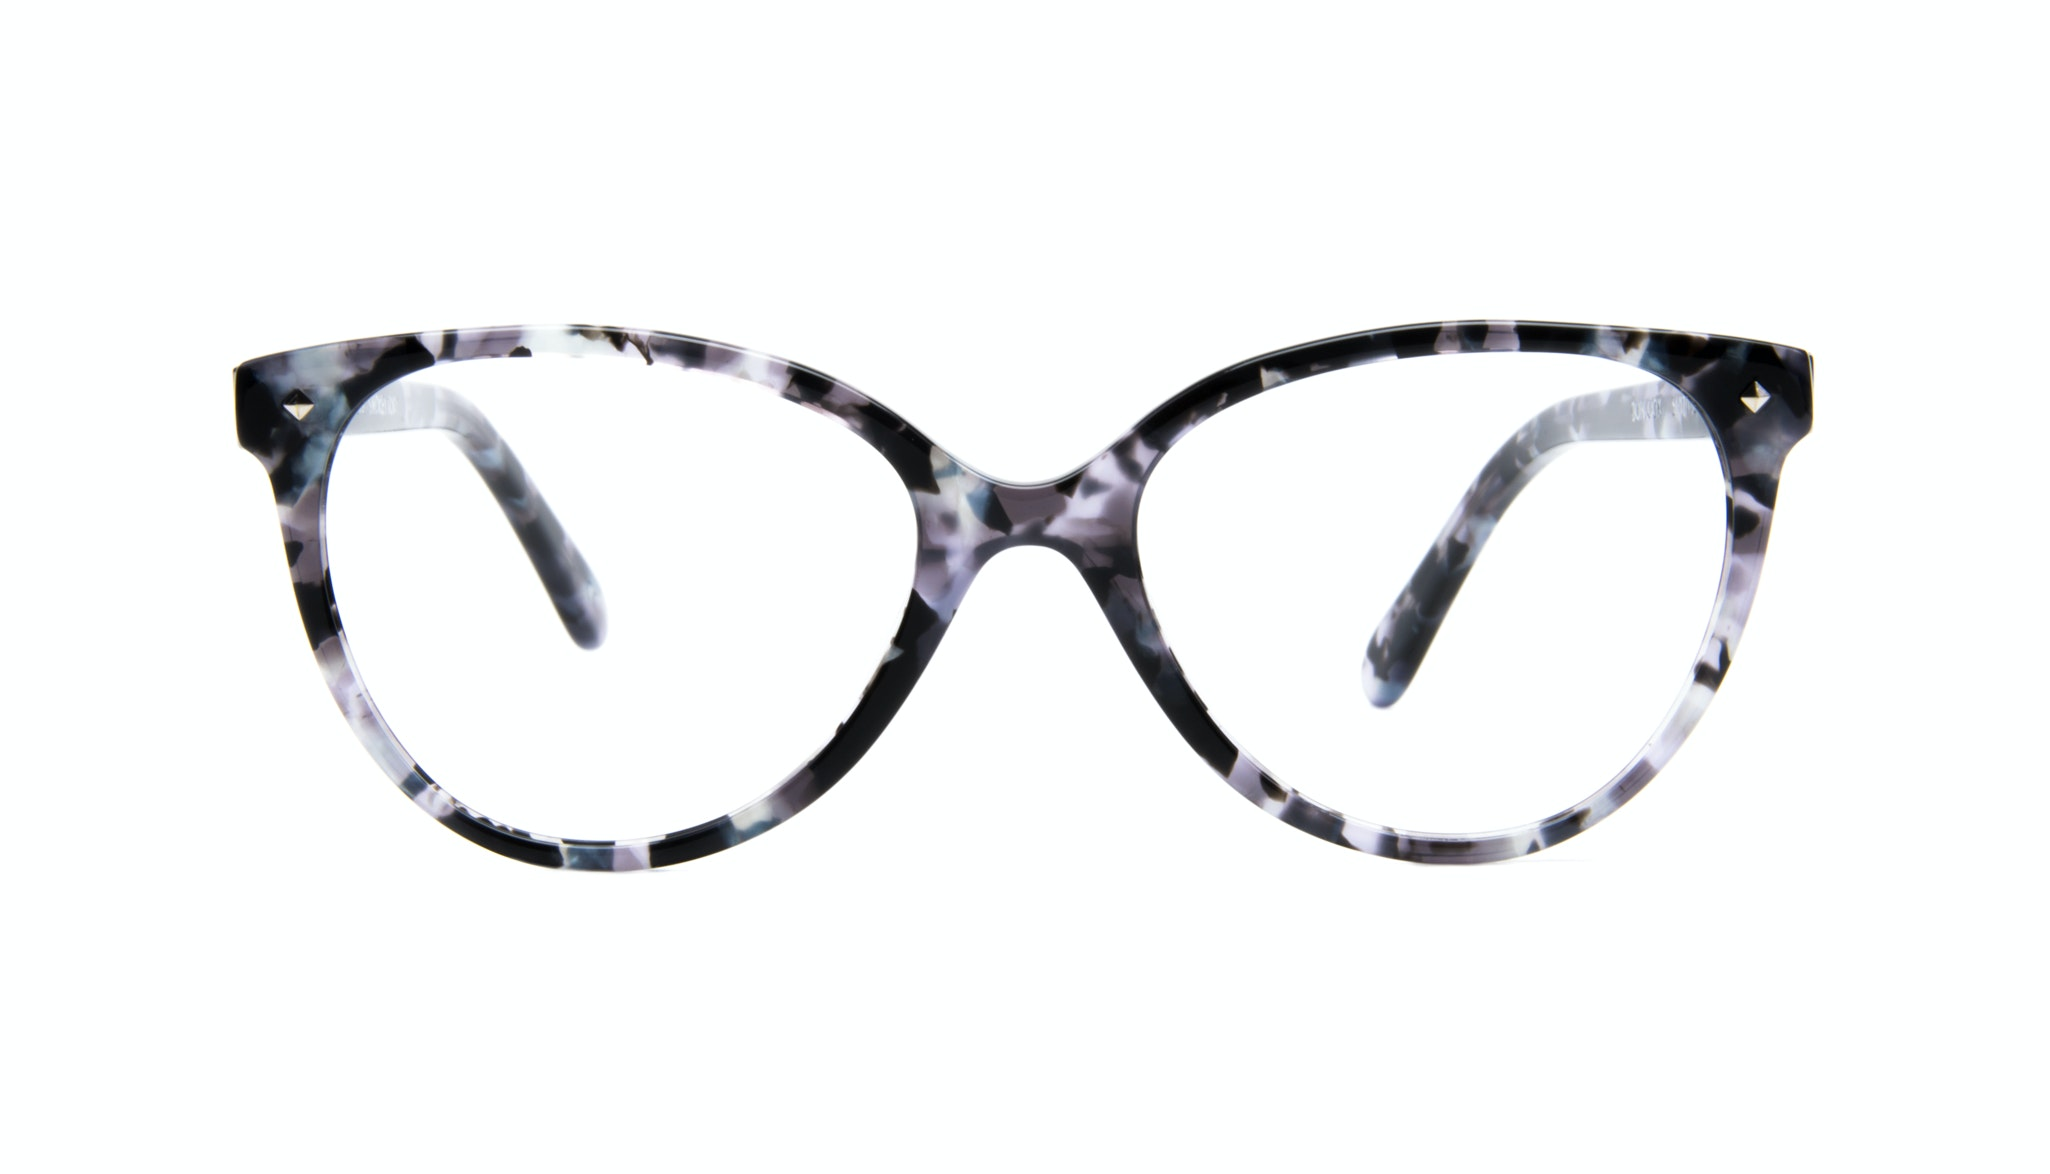 Affordable Fashion Glasses Cat Eye Eyeglasses Women Flawless Grey Tort